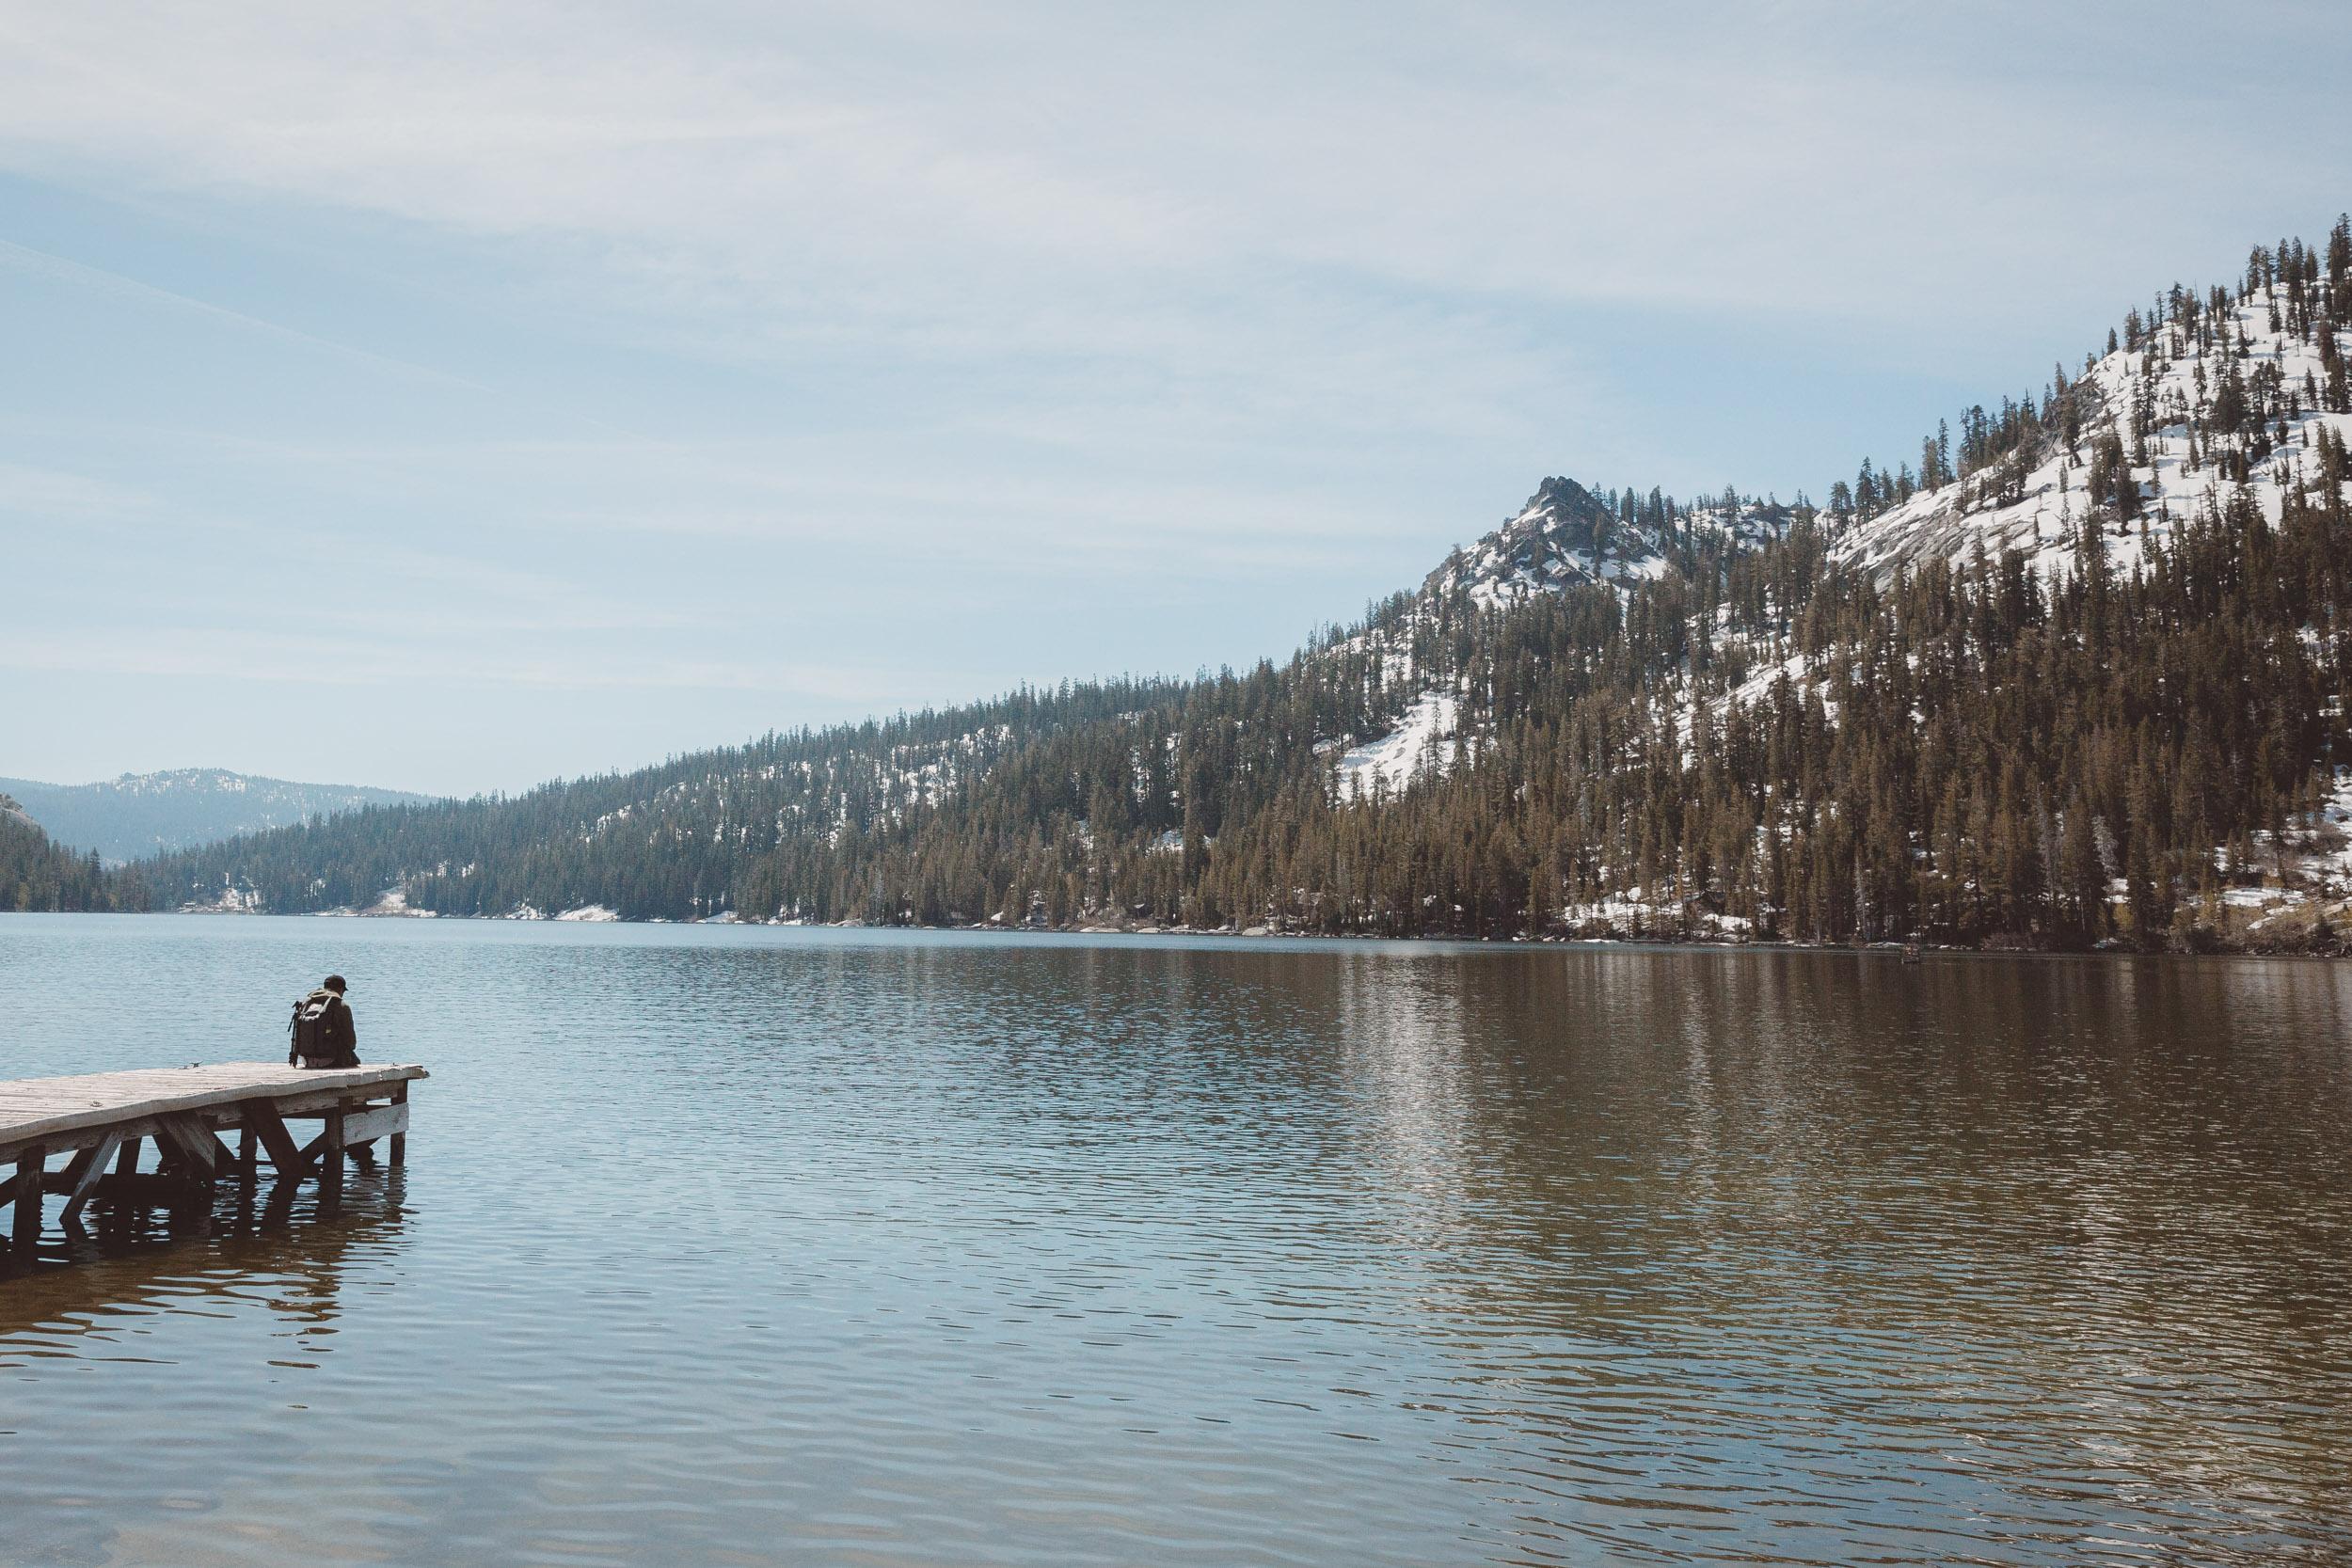 echo-lake-dock-views-hike-and-shoot-1.jpg